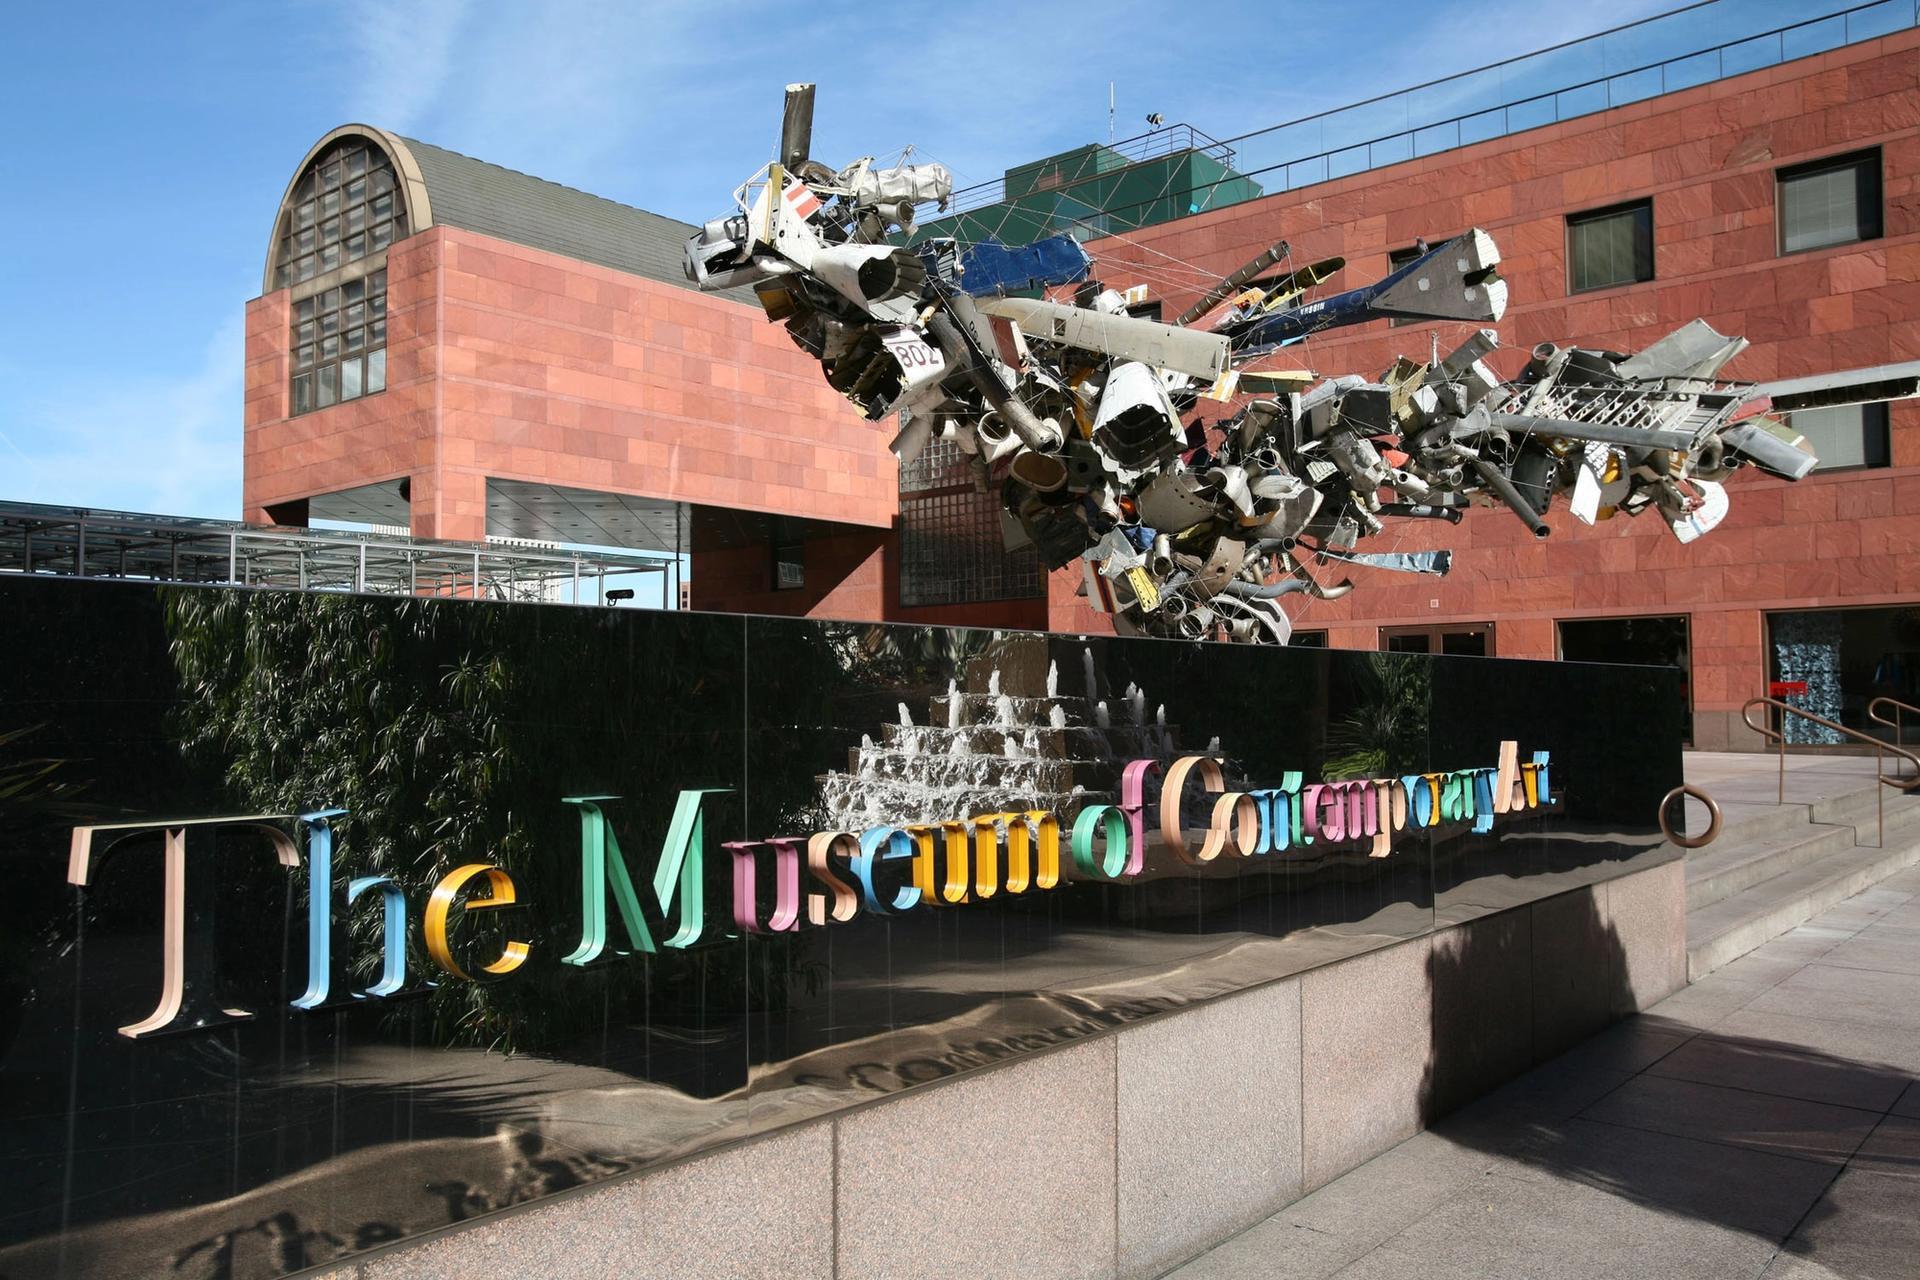 MoCA's Grand Avenue building, designed by Arata Isozaki Photo: Marissa Roth, courtesy of the Museum of Contemporary Art, Los Angeles